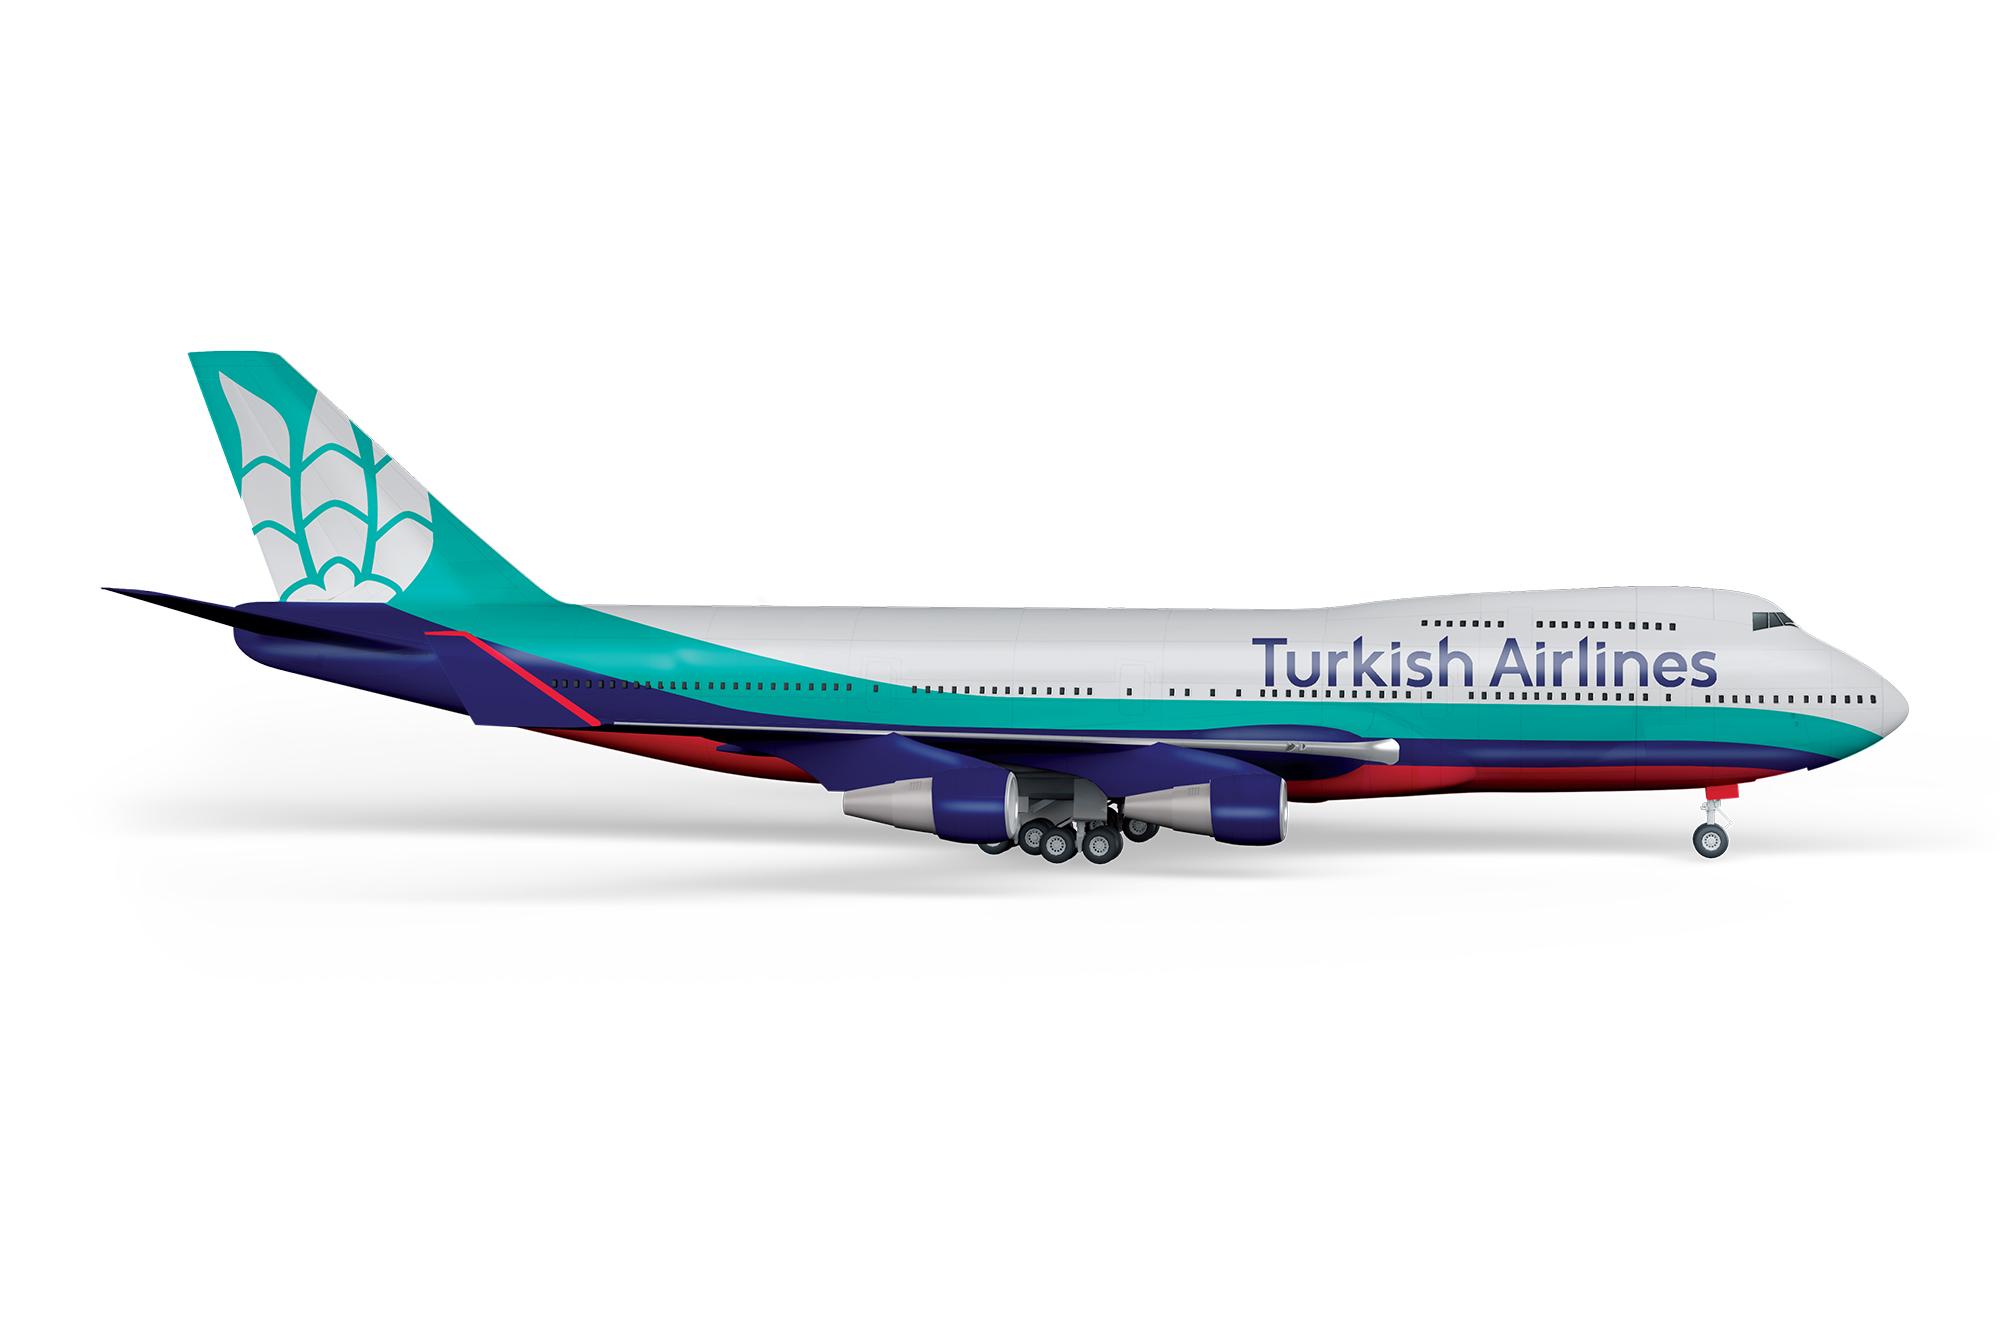 turkishairlines_airplane.jpg